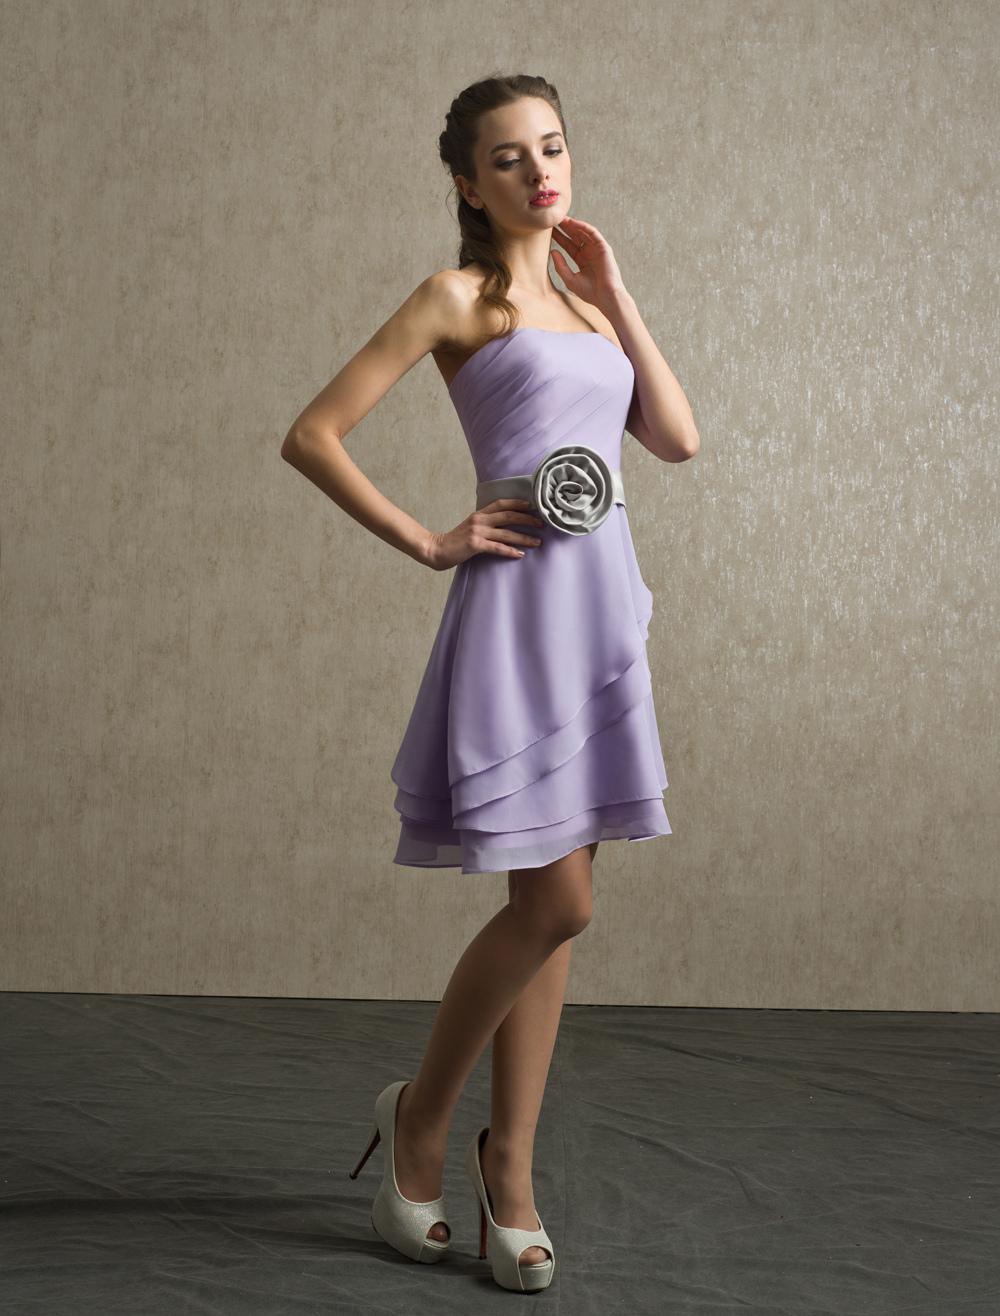 A-line Sash Chiffon Knee-Length Lavender Bridesmaid Dress with Strapless Neck